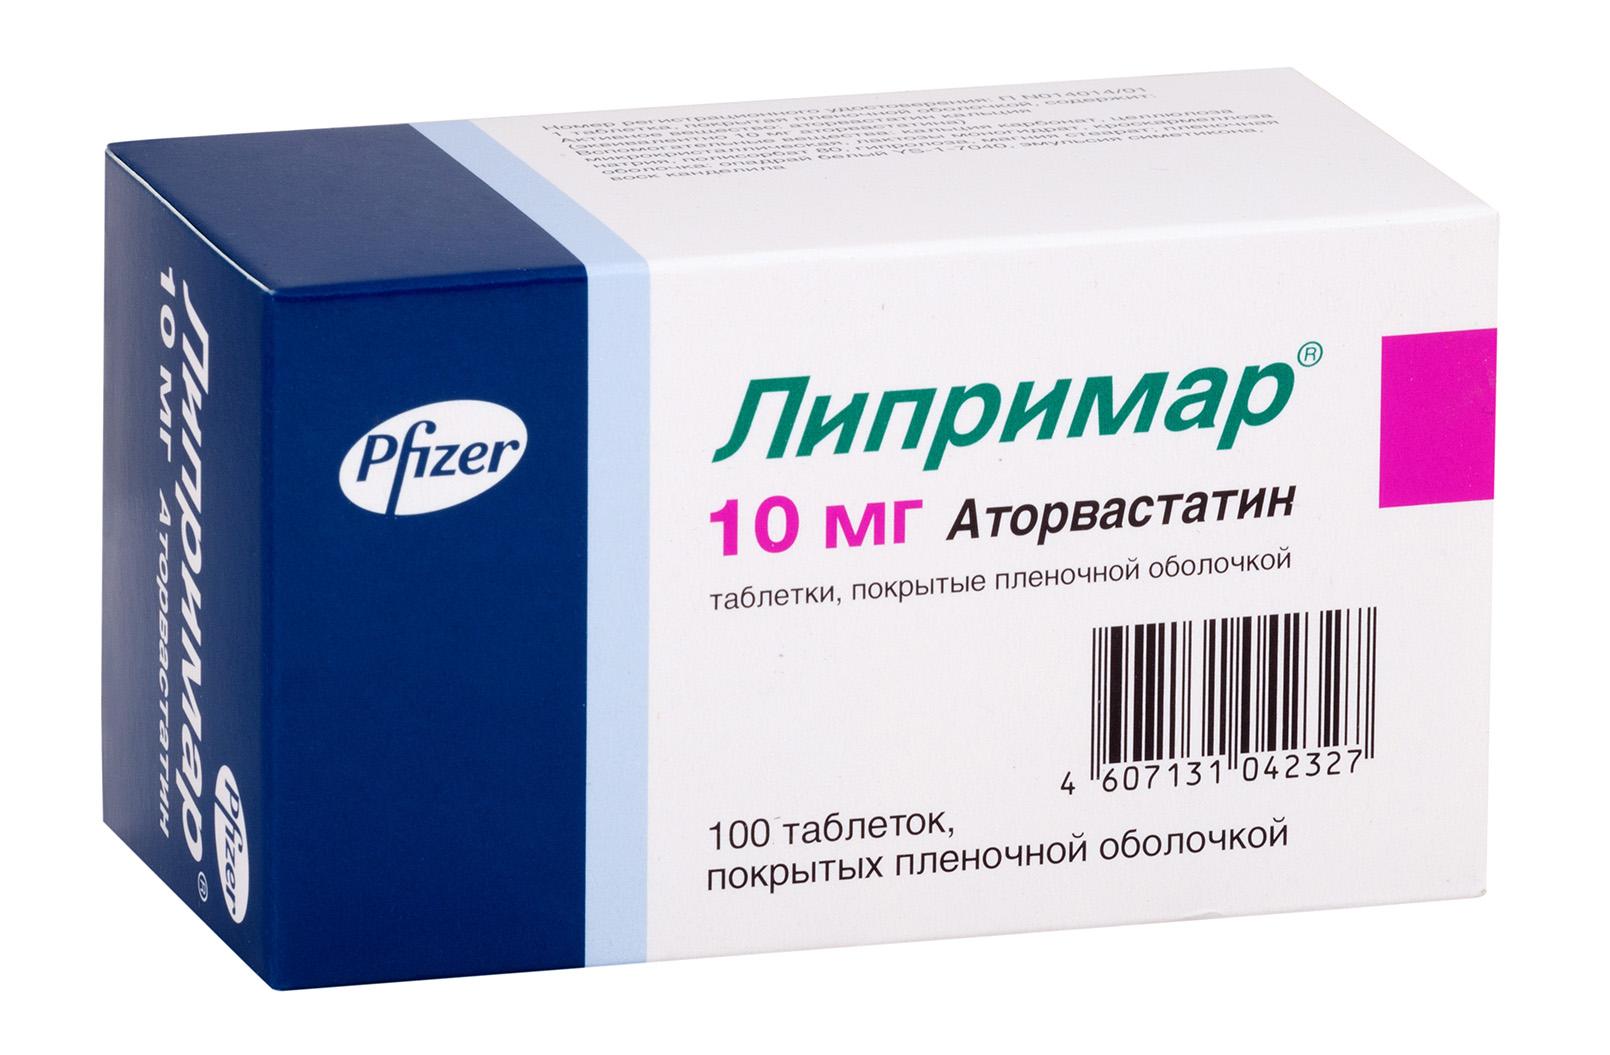 Липримар таб. п.п.о. 10мг n100